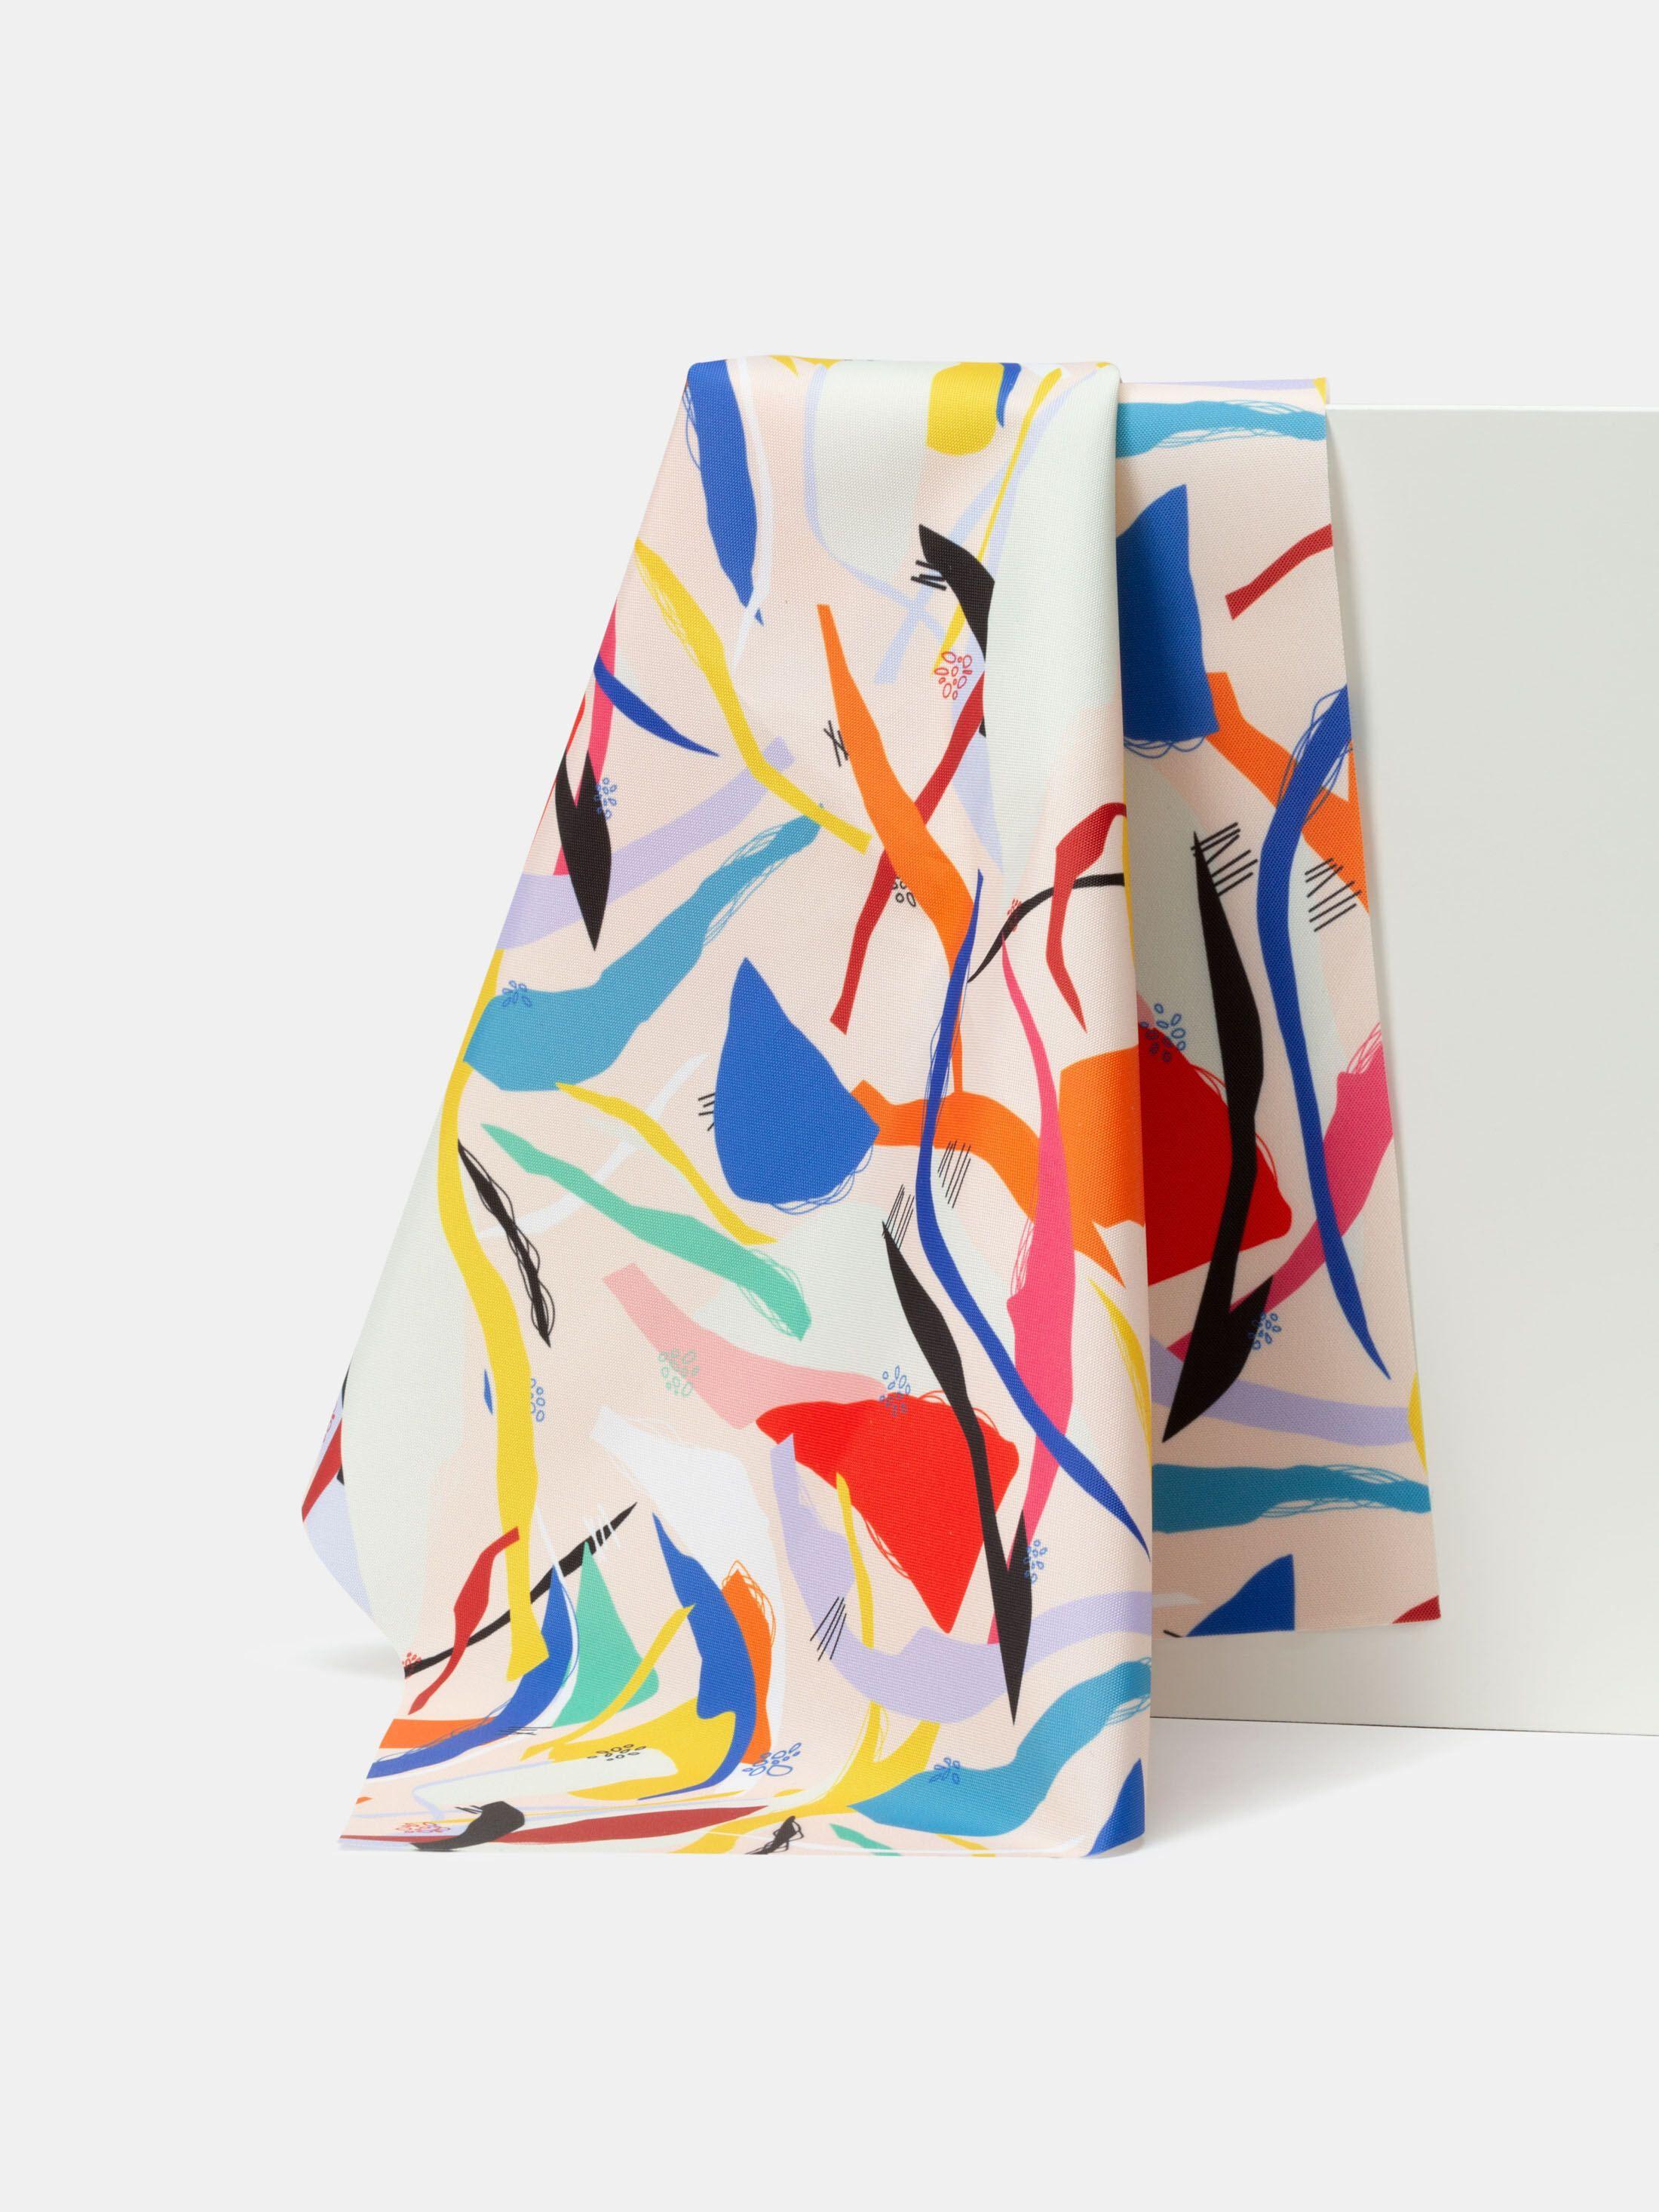 Linden Waterproof digital print fabric water resistant